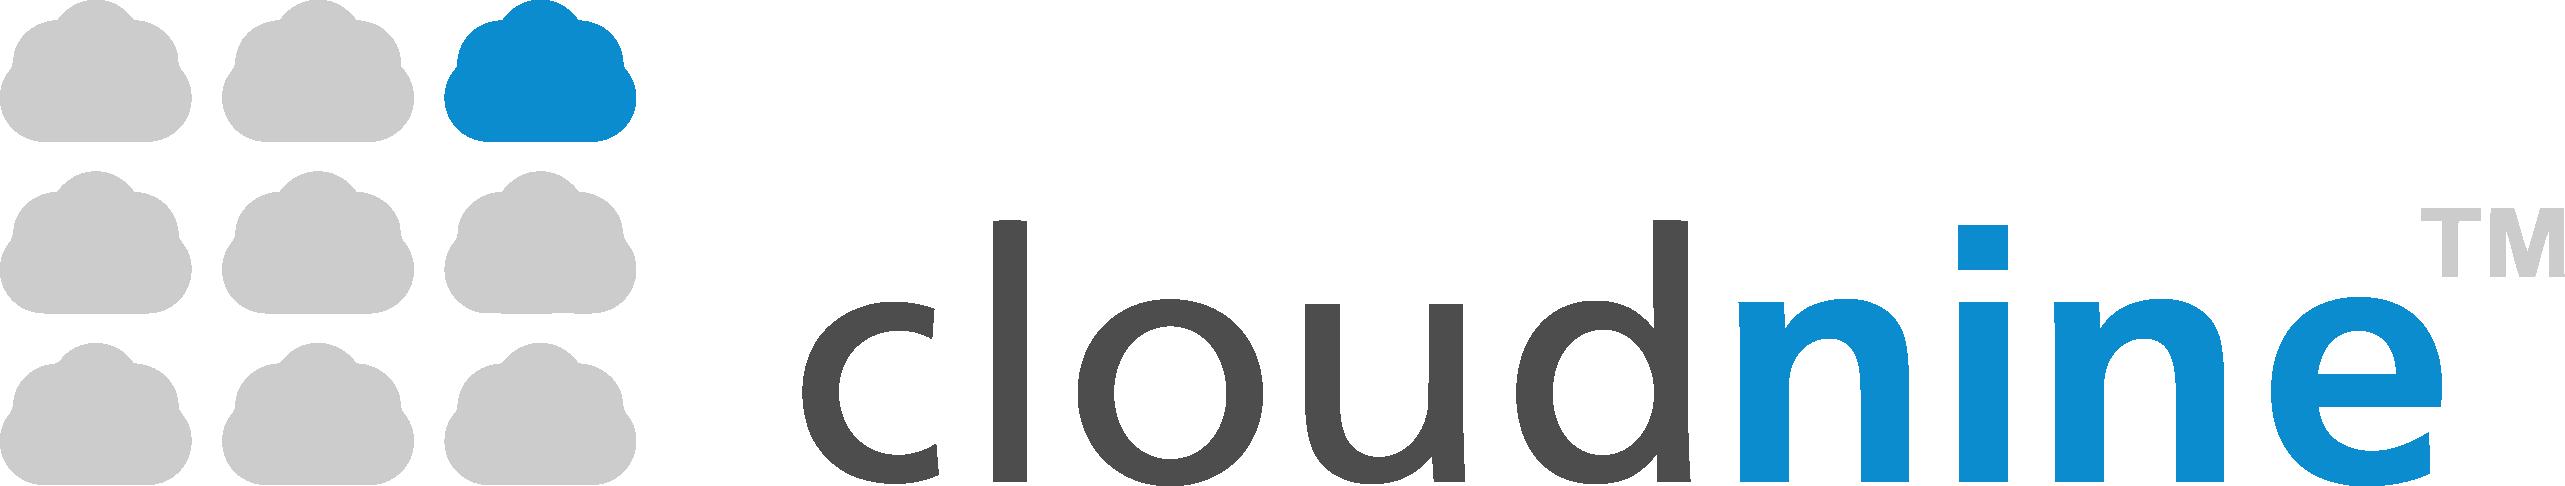 CloudNine eDiscovery logo